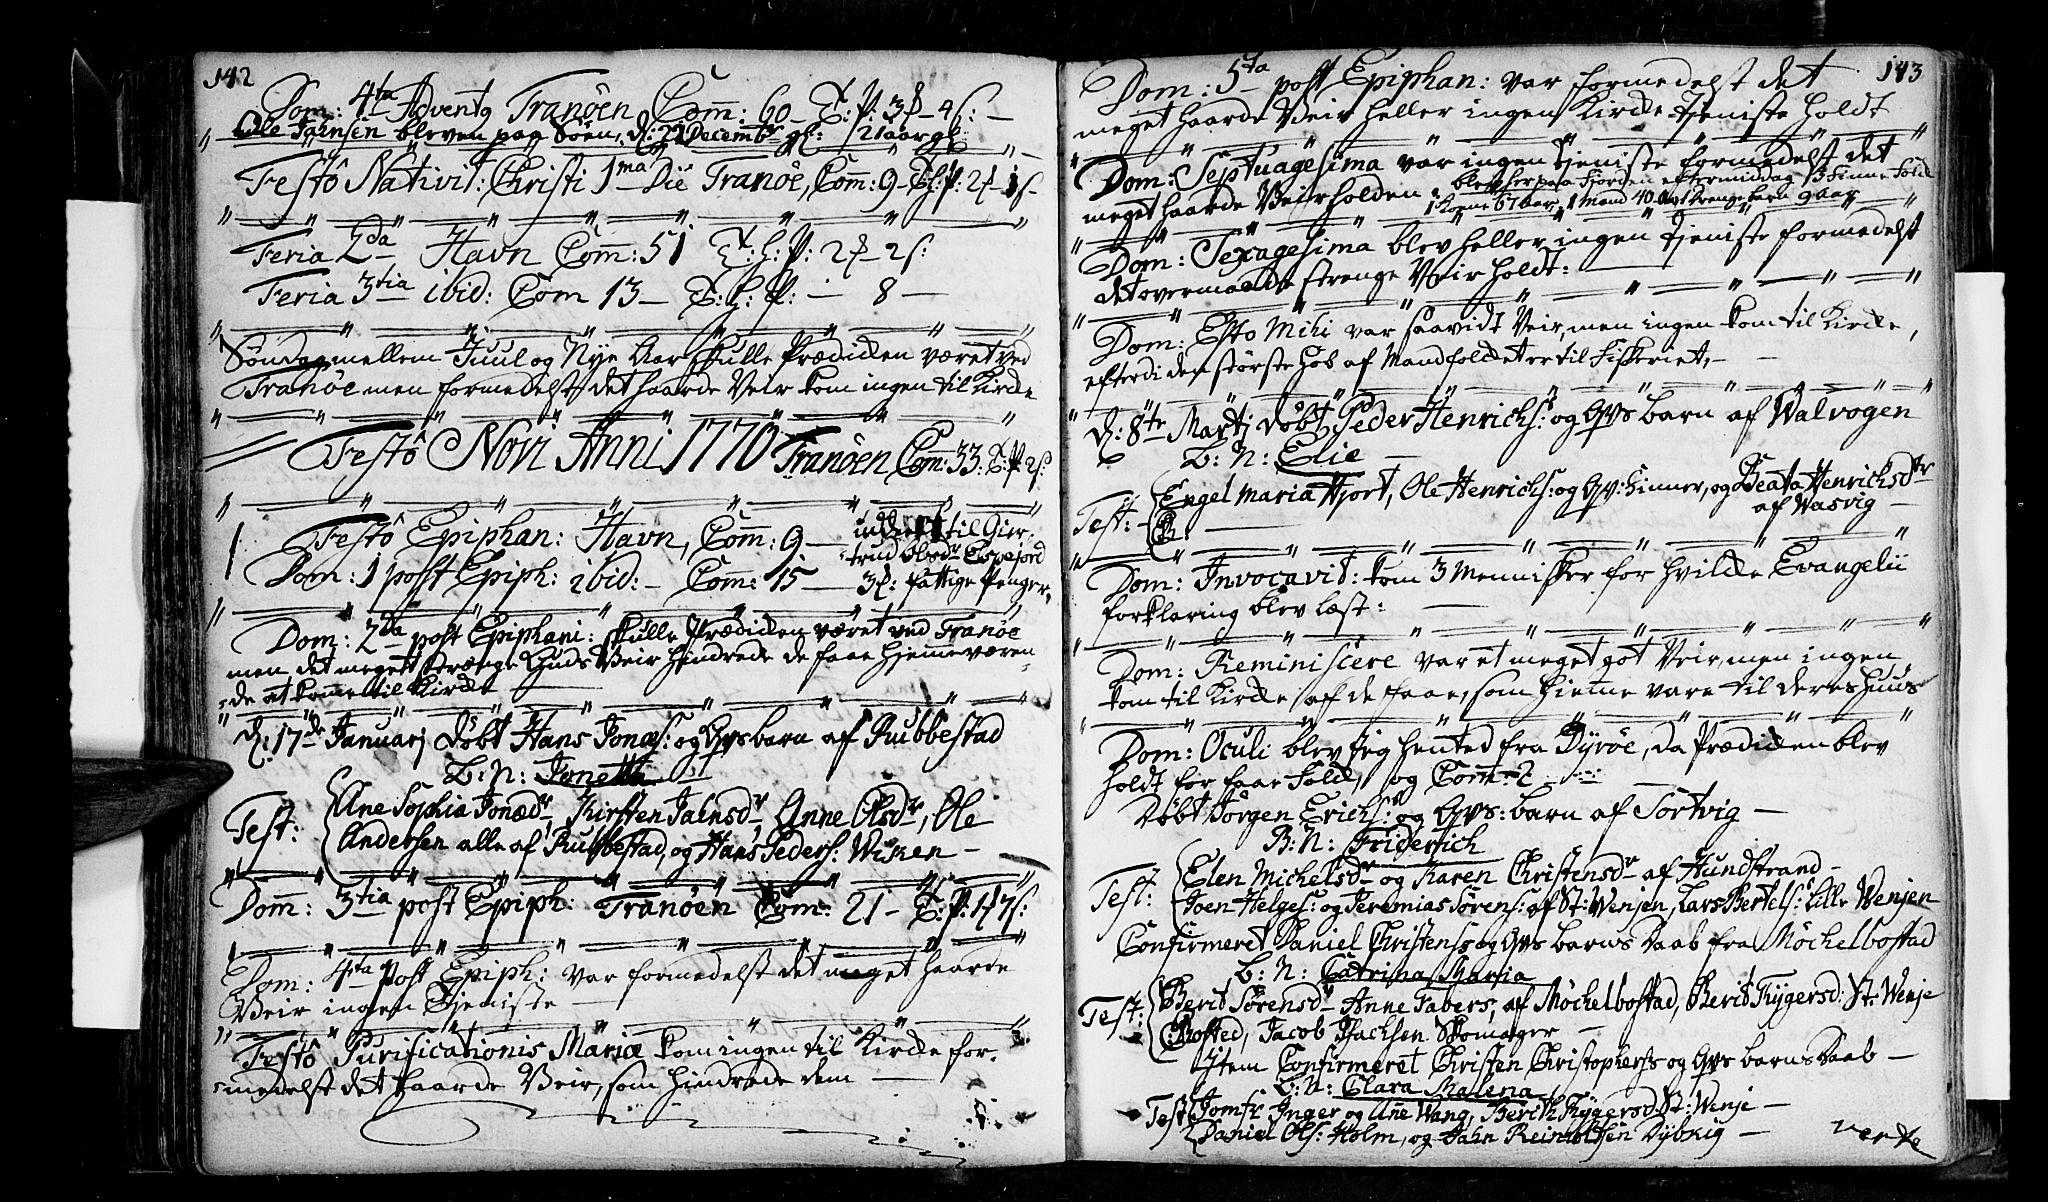 SATØ, Tranøy sokneprestkontor, I/Ia/Iaa/L0001kirke: Ministerialbok nr. 1, 1757-1773, s. 142-143